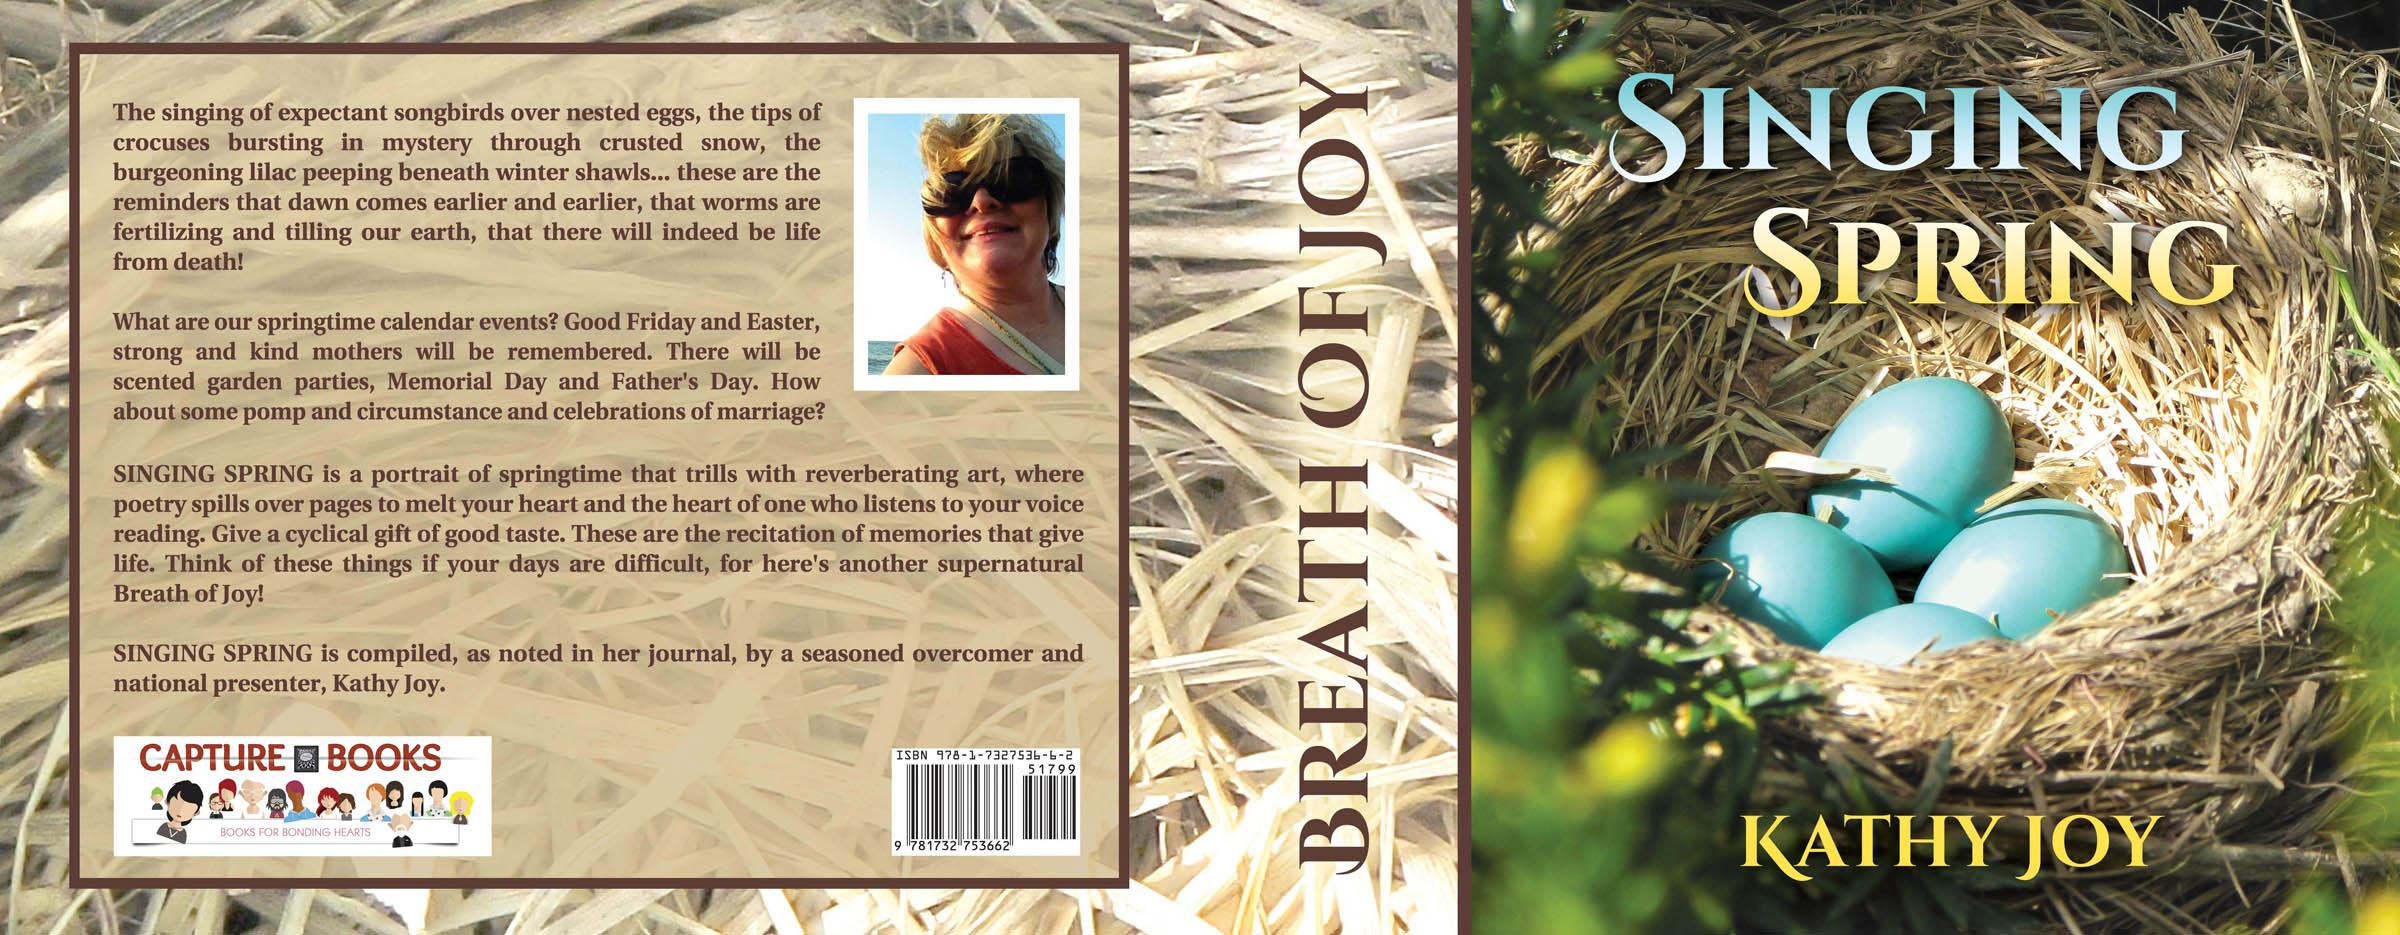 Singing Spring by Kathy Joy